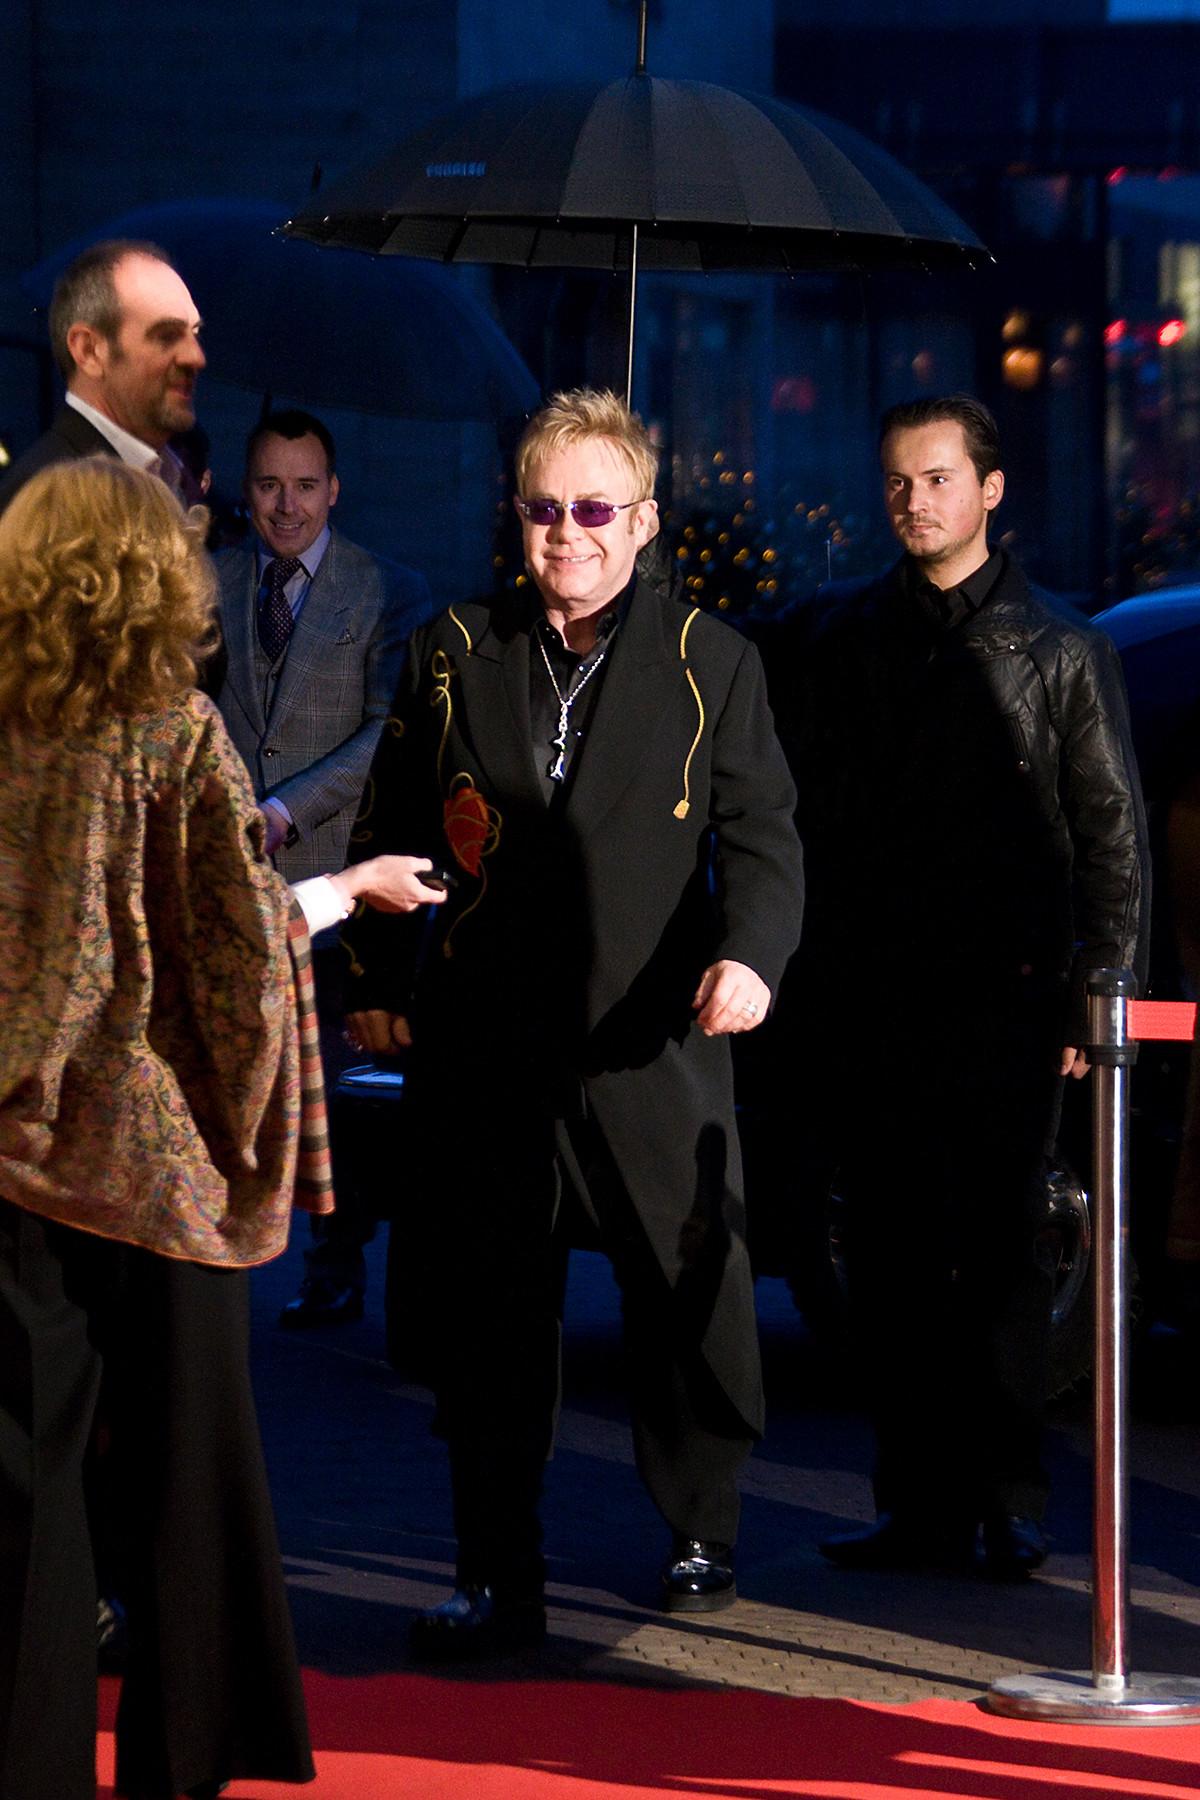 Elton John antes del concierto en Barvija